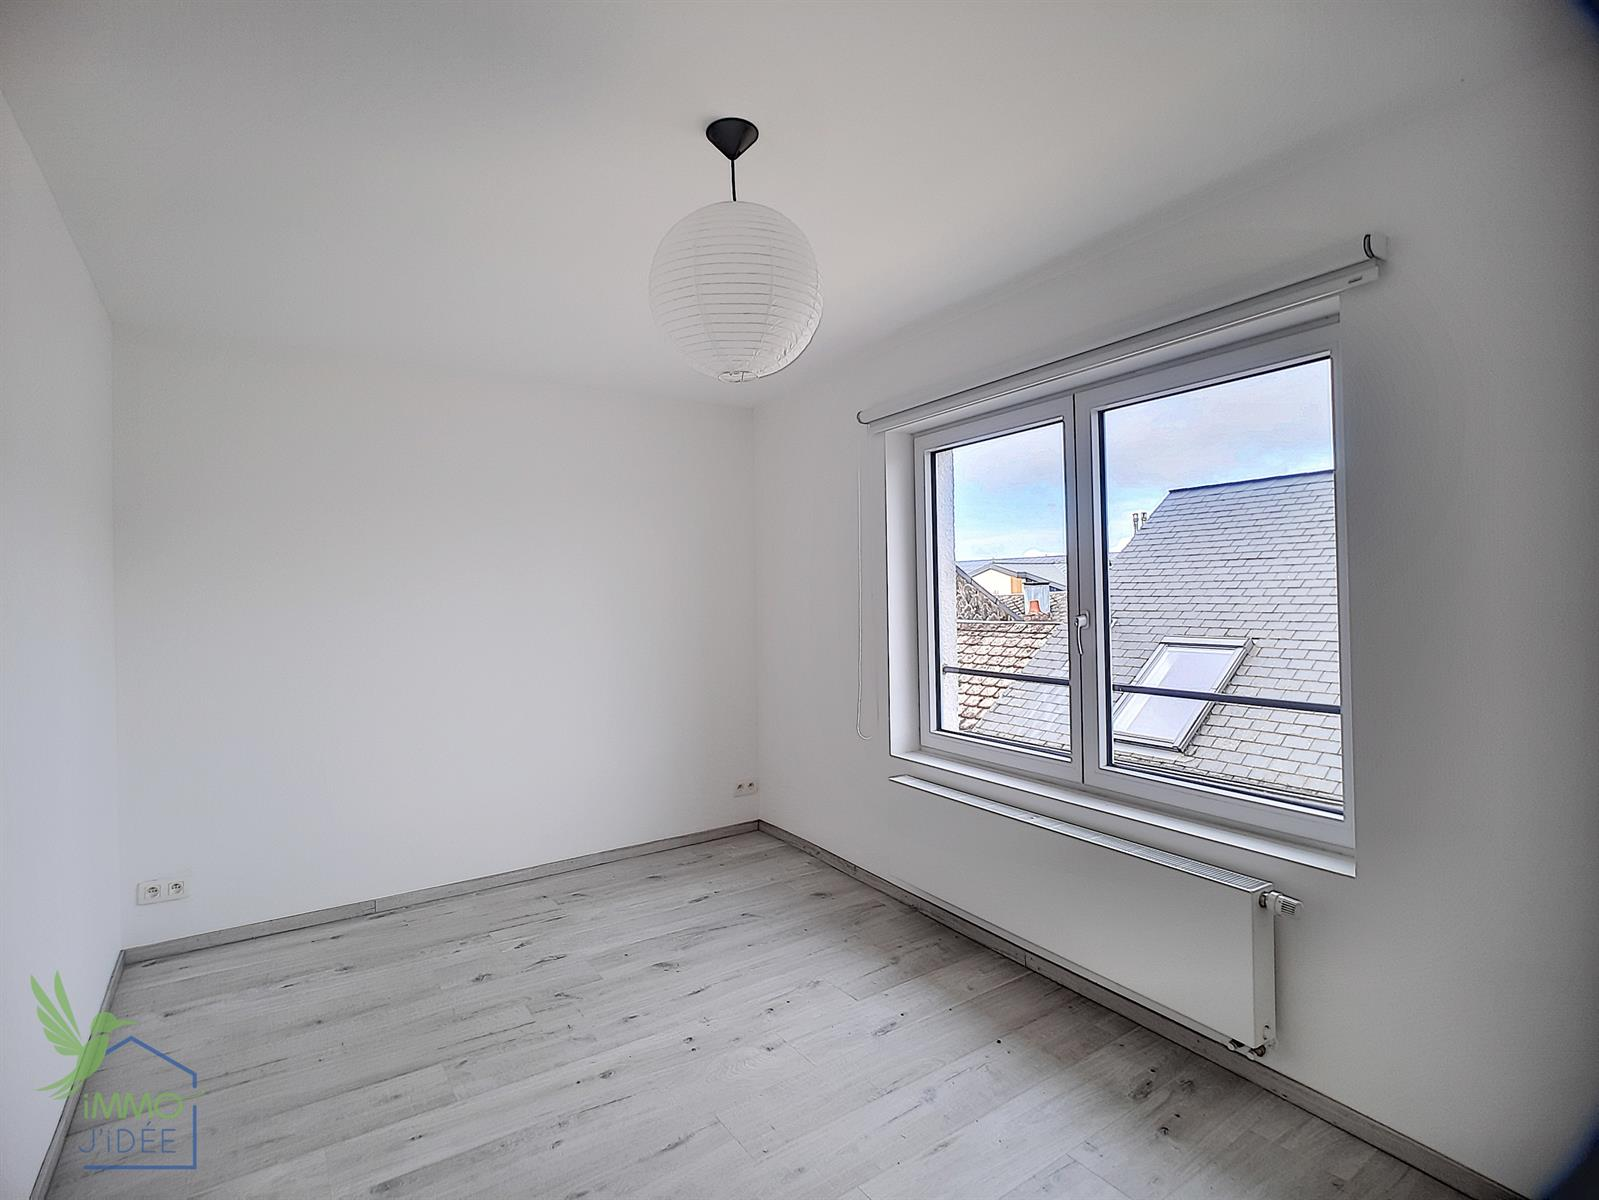 Bel-etage - Arlon - #4447992-5